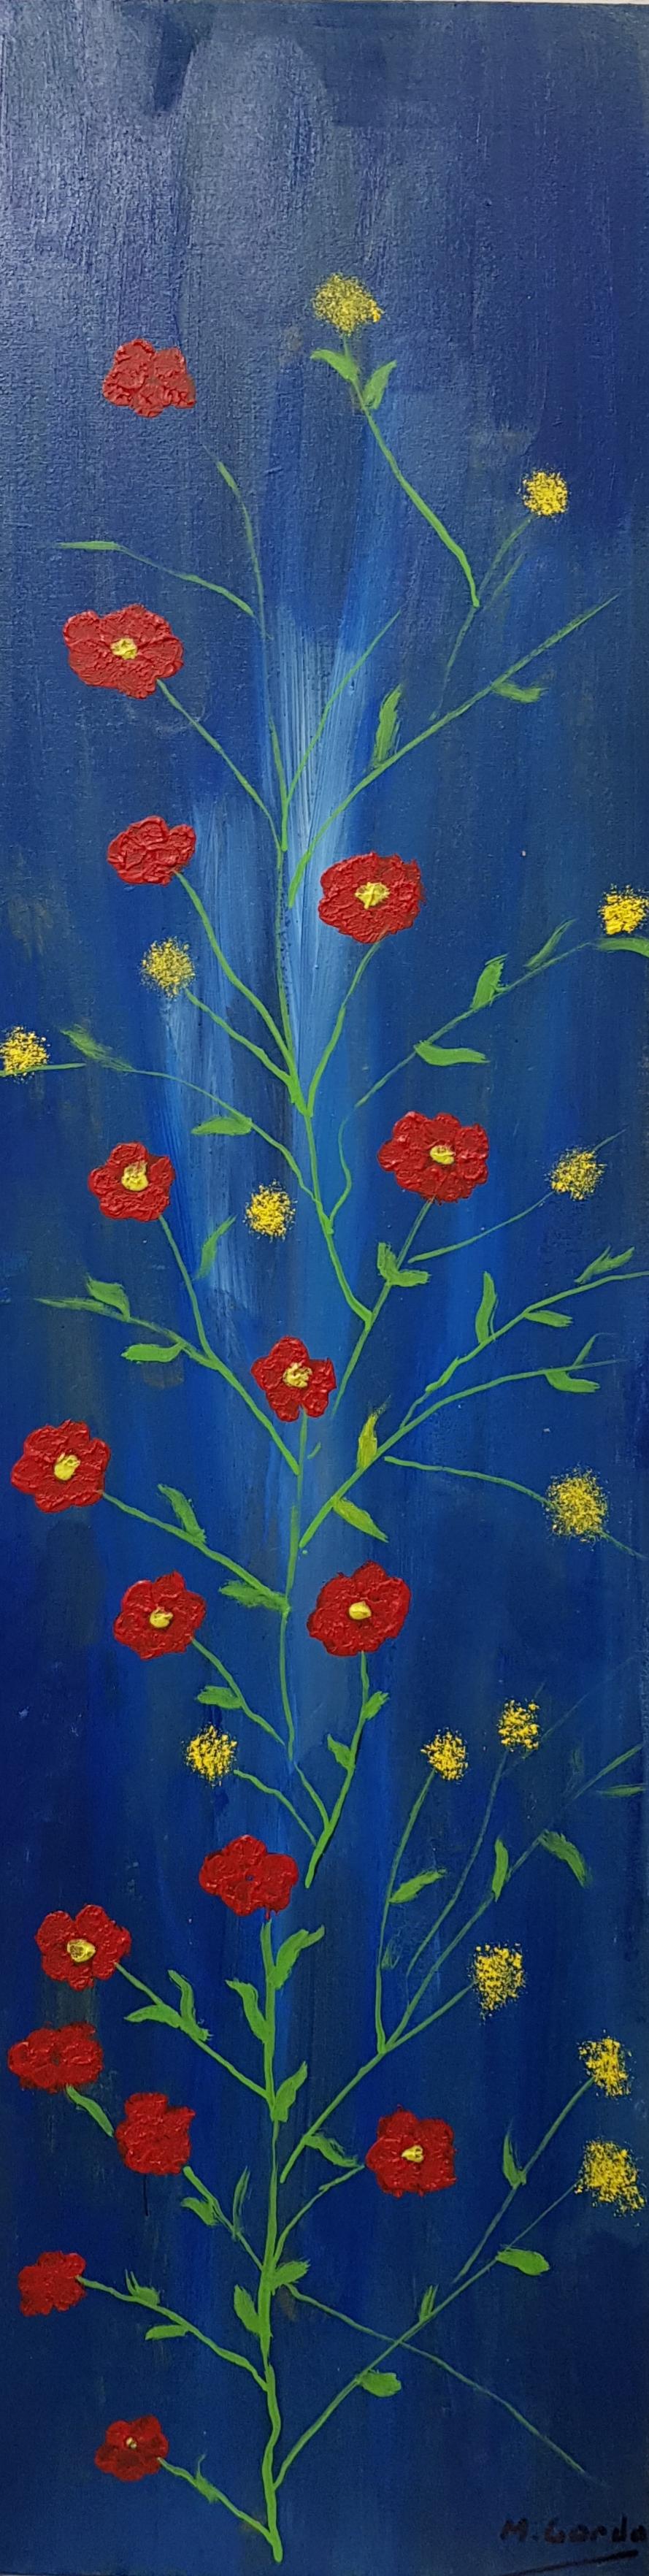 Flores. 6 rojas